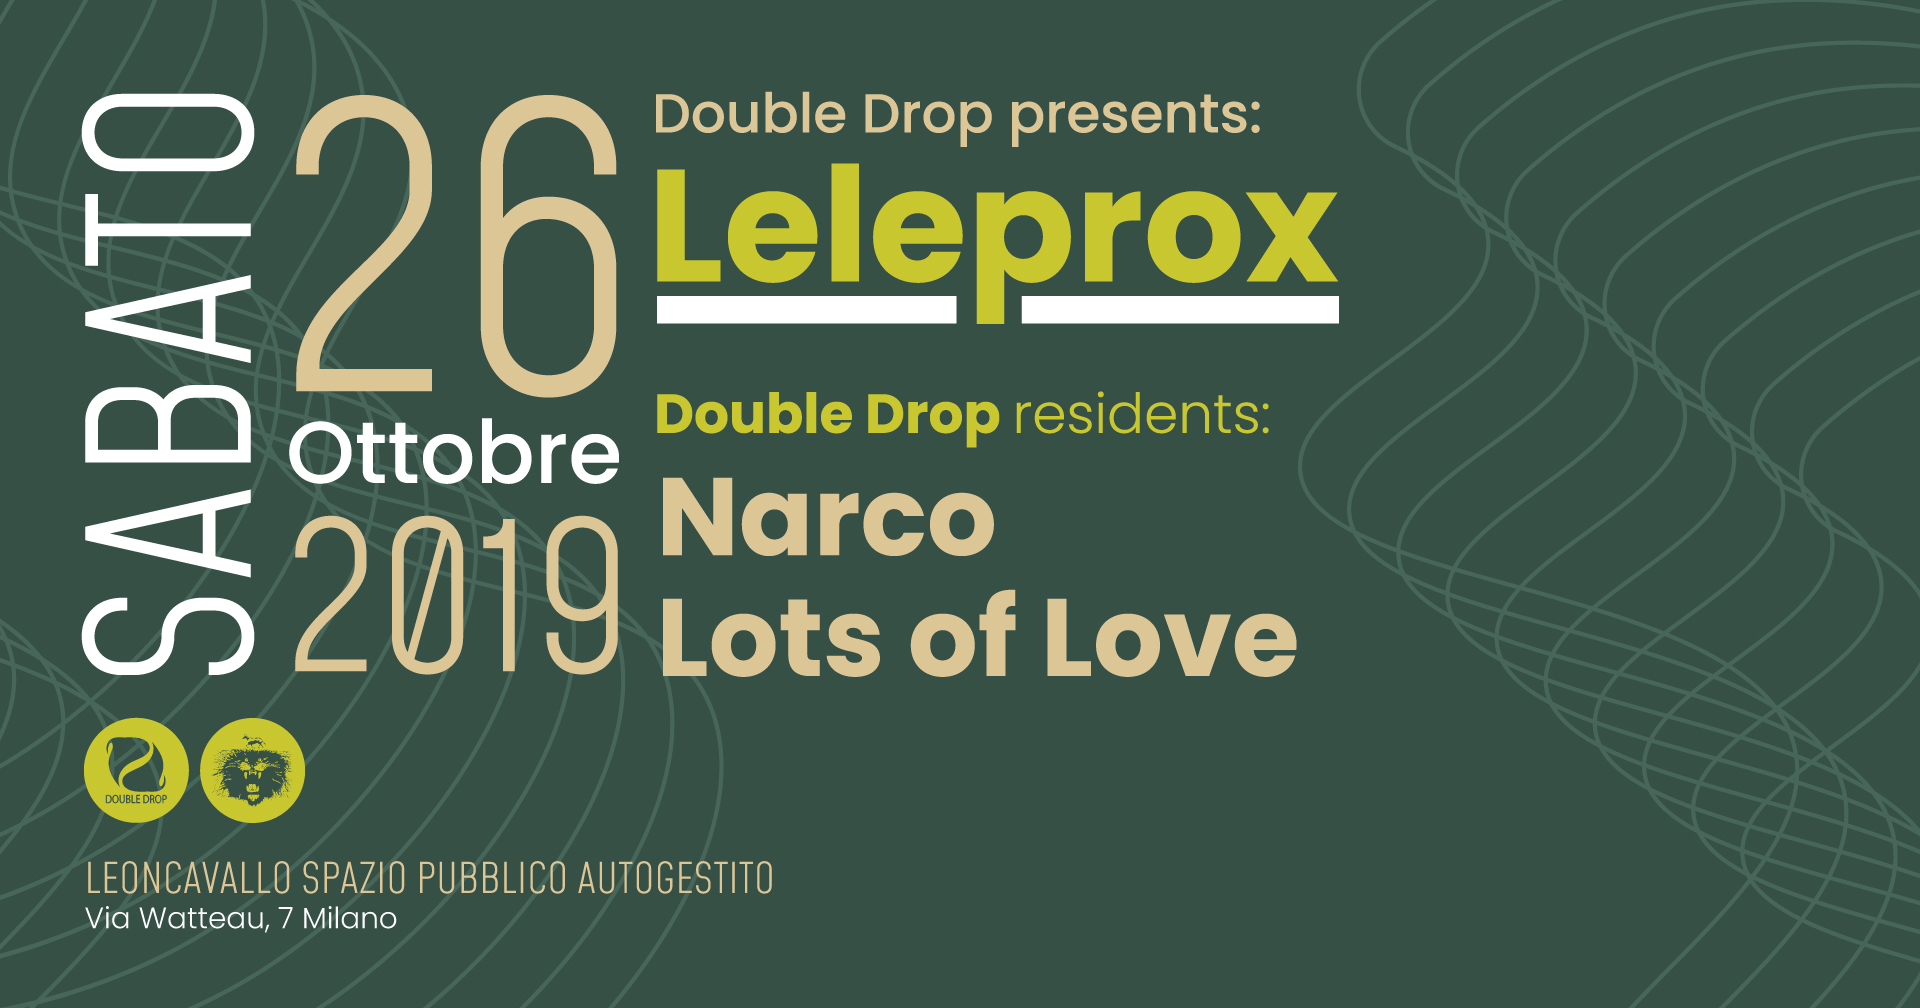 Double Drop presents Leleprox